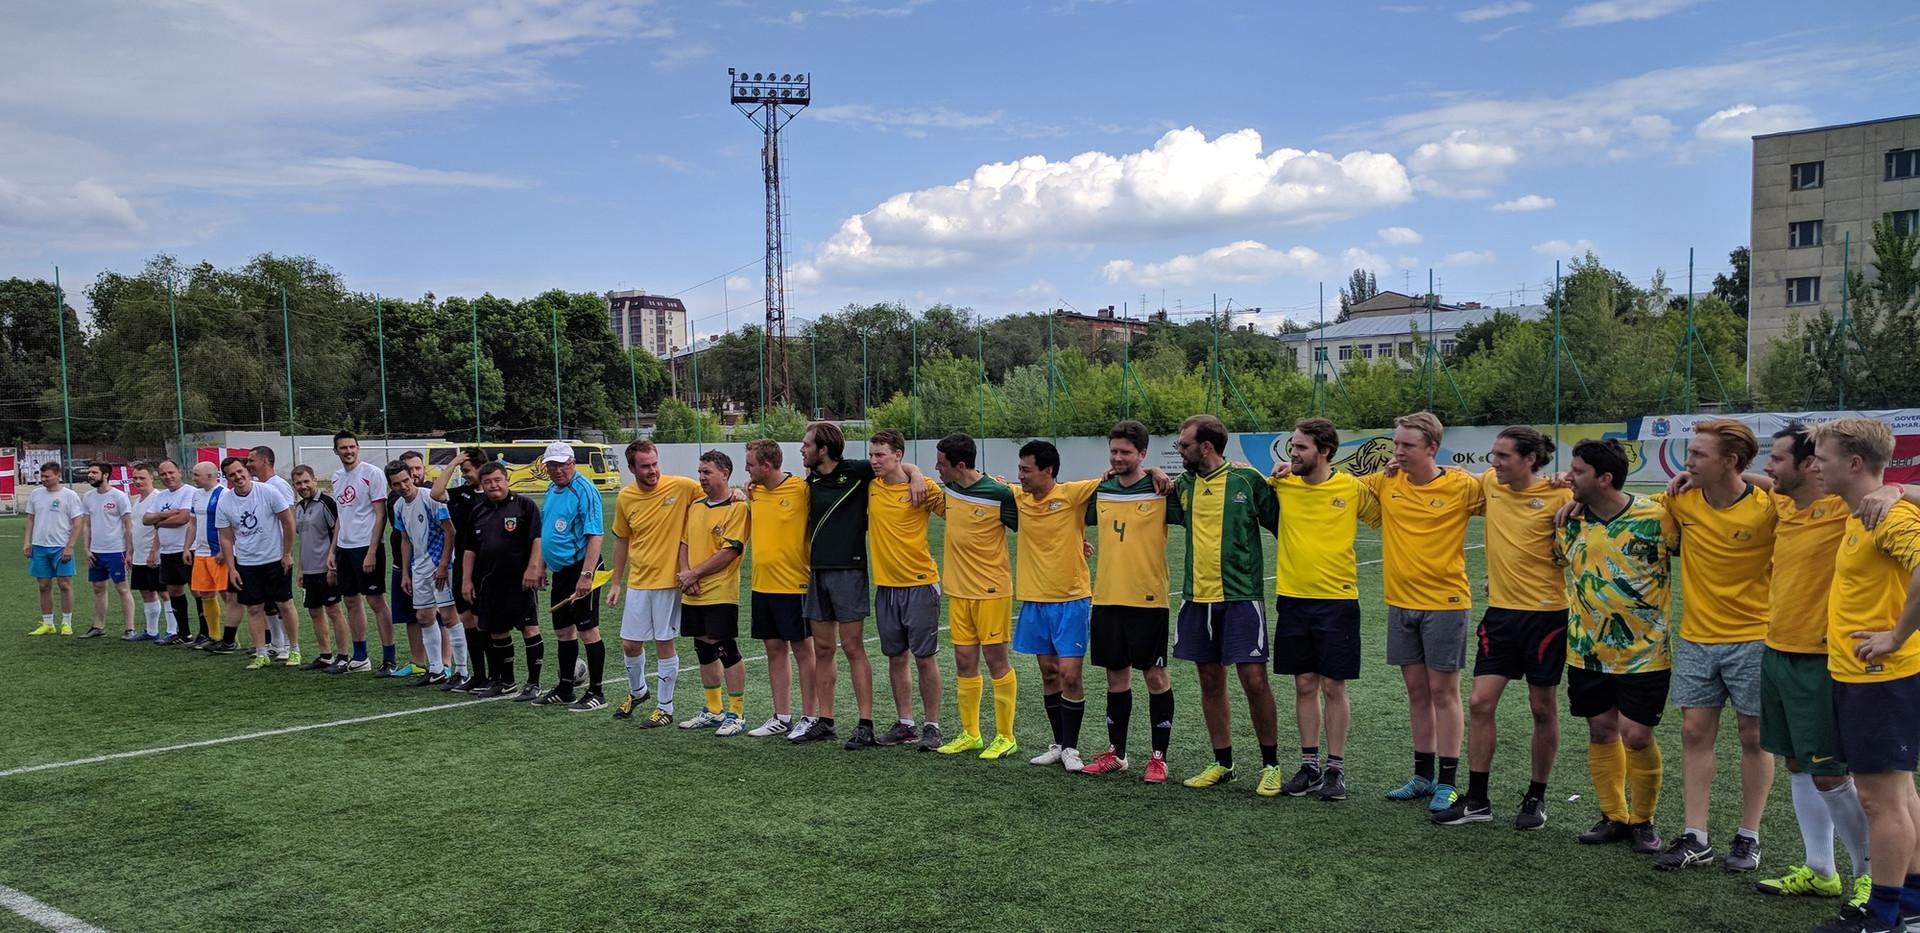 Aussie Supporteroos v Samara Press Team at Cosmos Cup in Samara